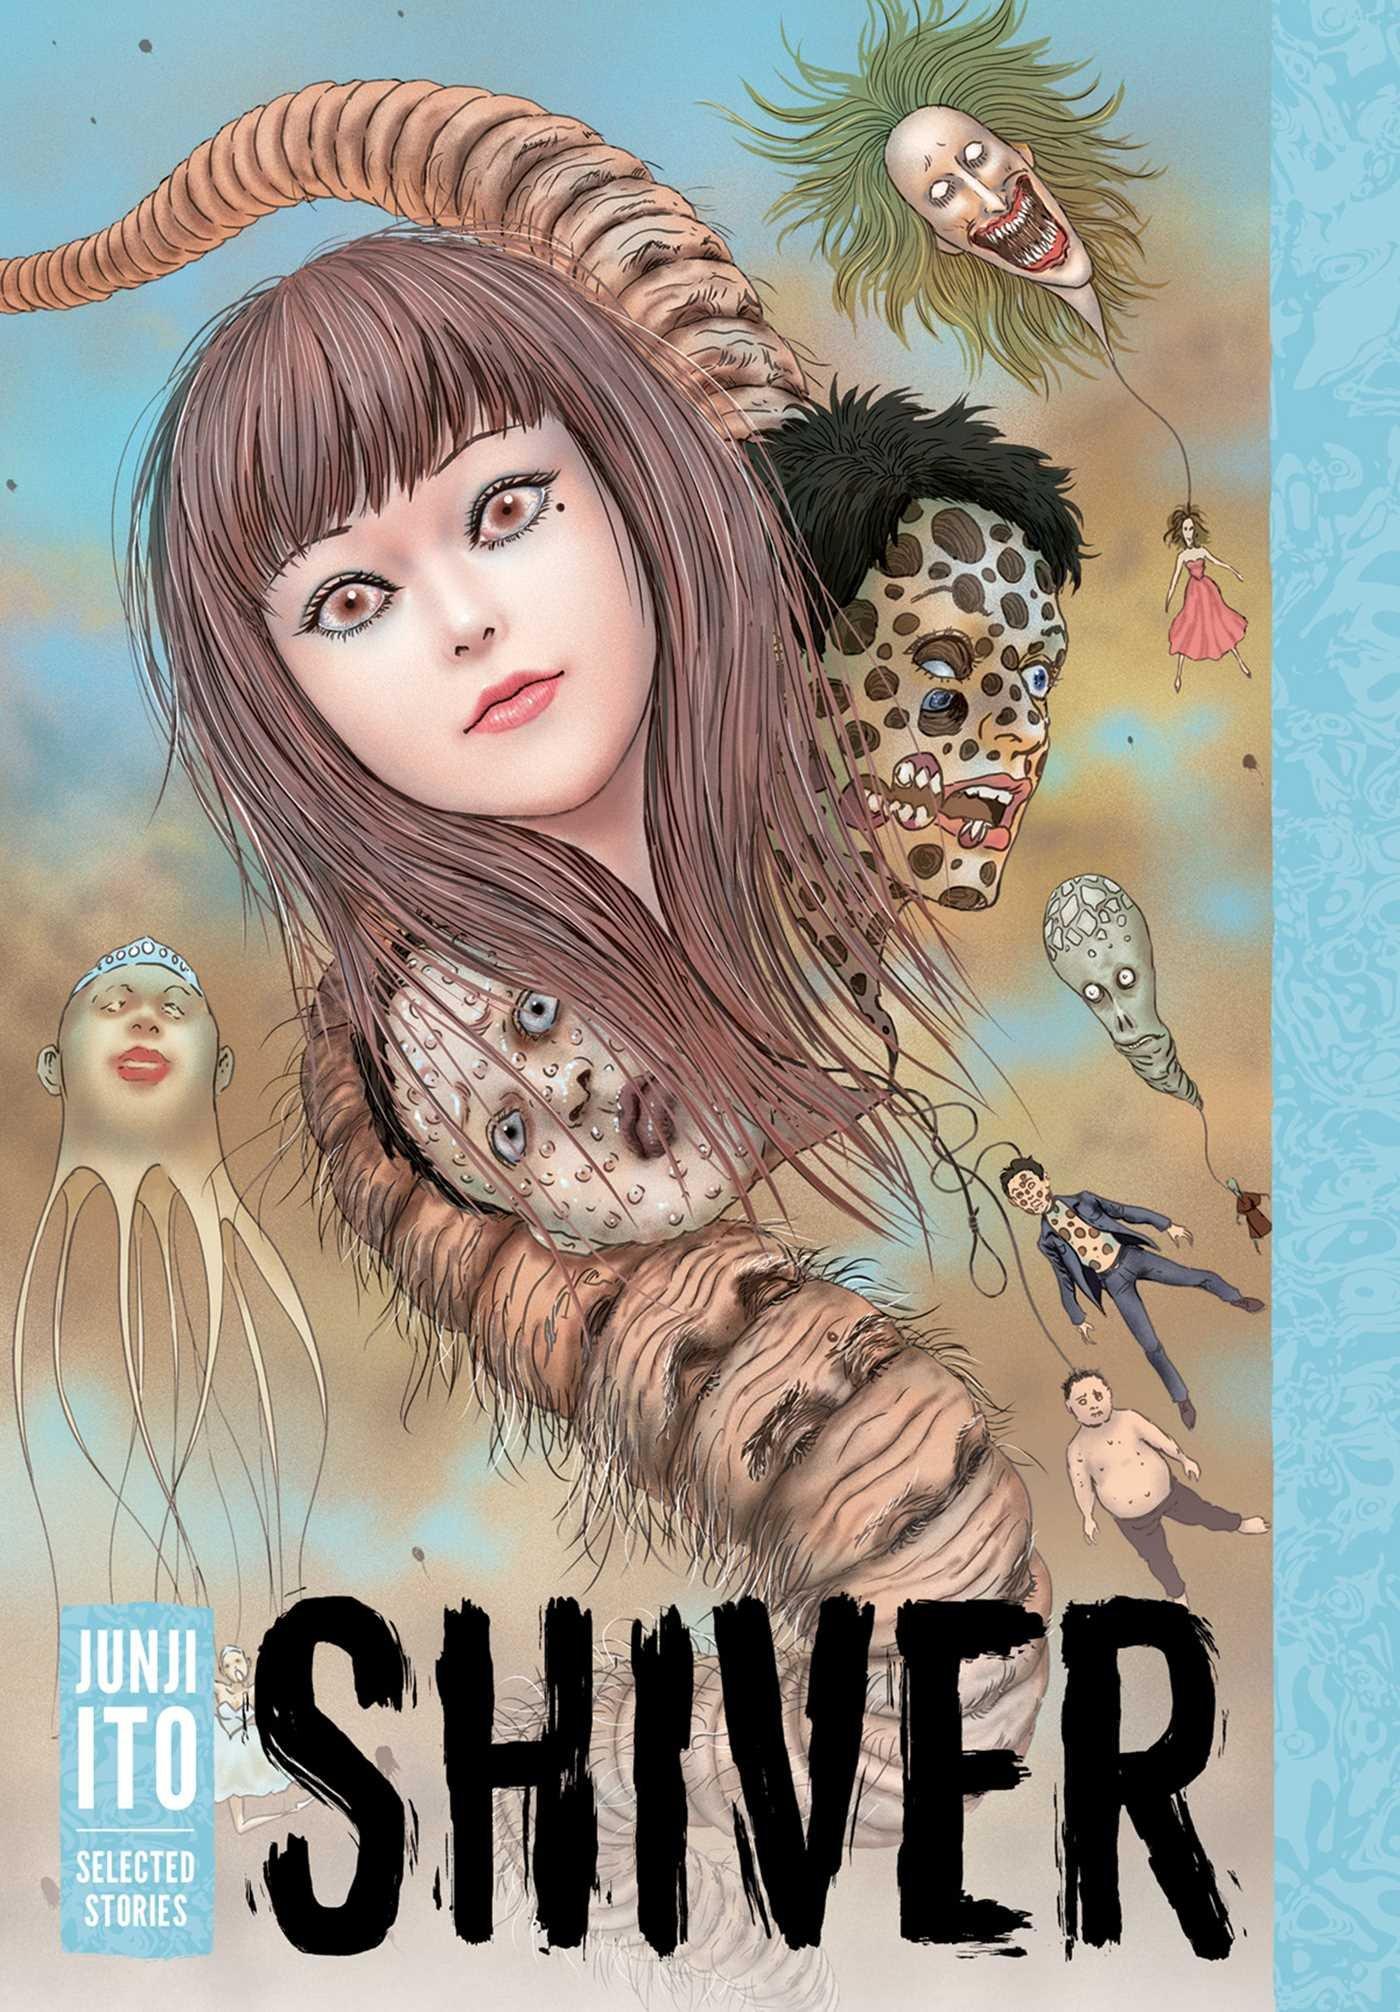 Shiver: Junji Ito Selected Stories (Inglese) Copertina rigida – 14 dic 2017 Viz 1421596938 Comics & Graphic Novels Manga